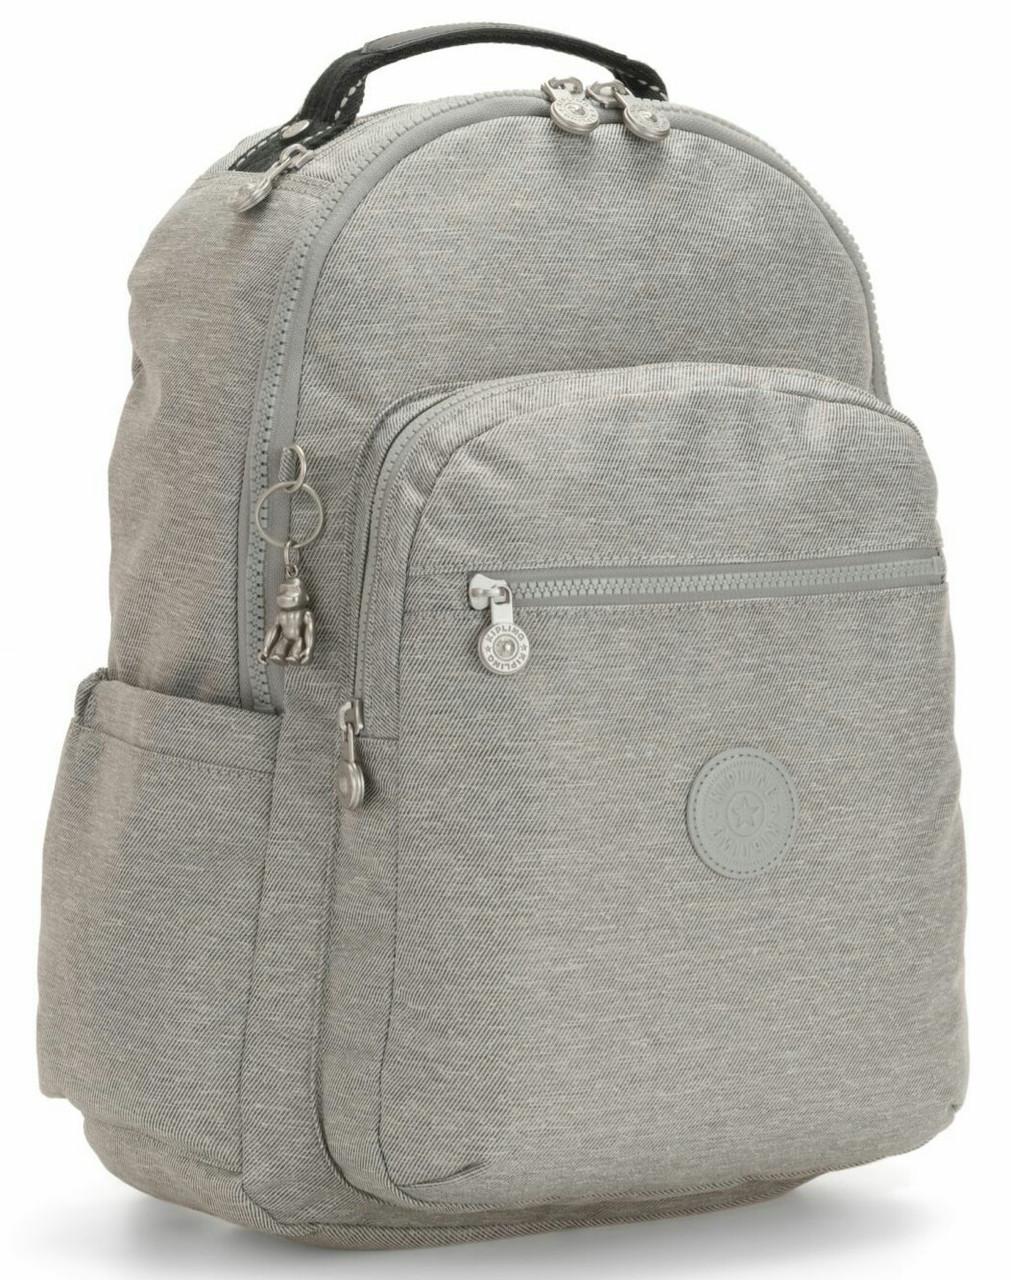 Рюкзак городской из ткани Kipling Peppery серый 16л